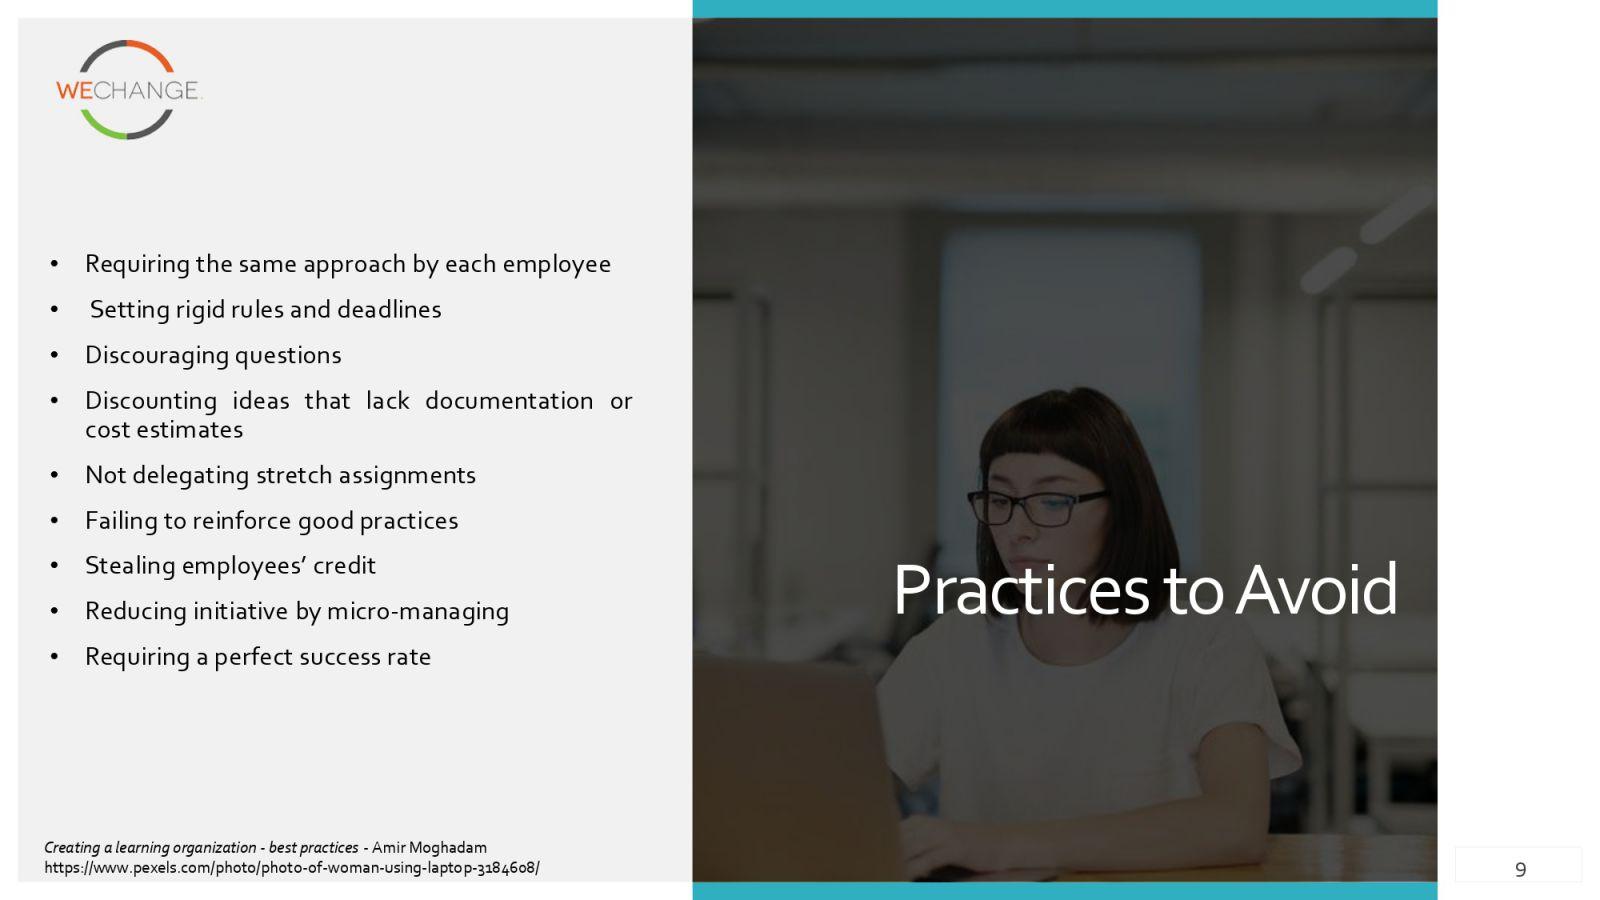 learnin organization in practice page 0009 compressed The learning organization in practice